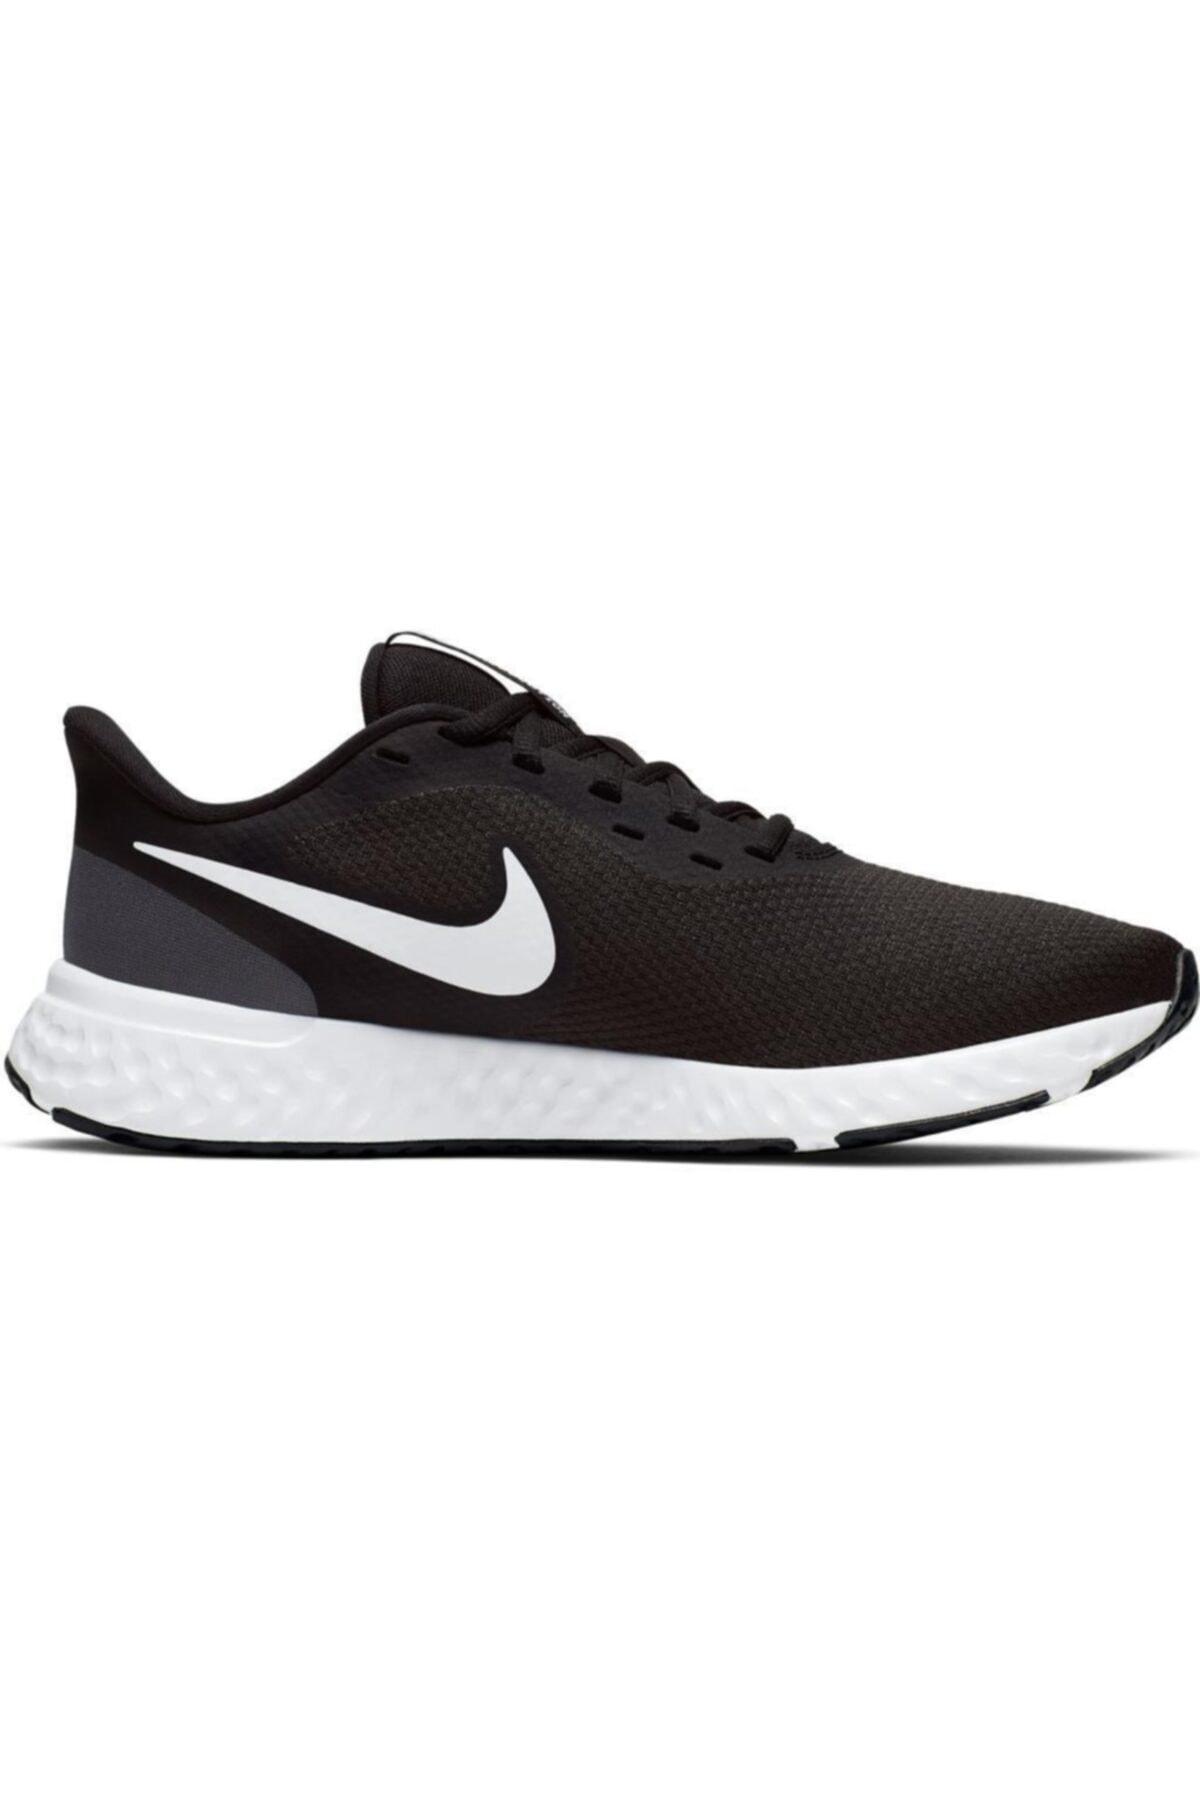 Nike Bq3207-002 Wmns Revolution 5 Kadın Spor Ayakkabı 1